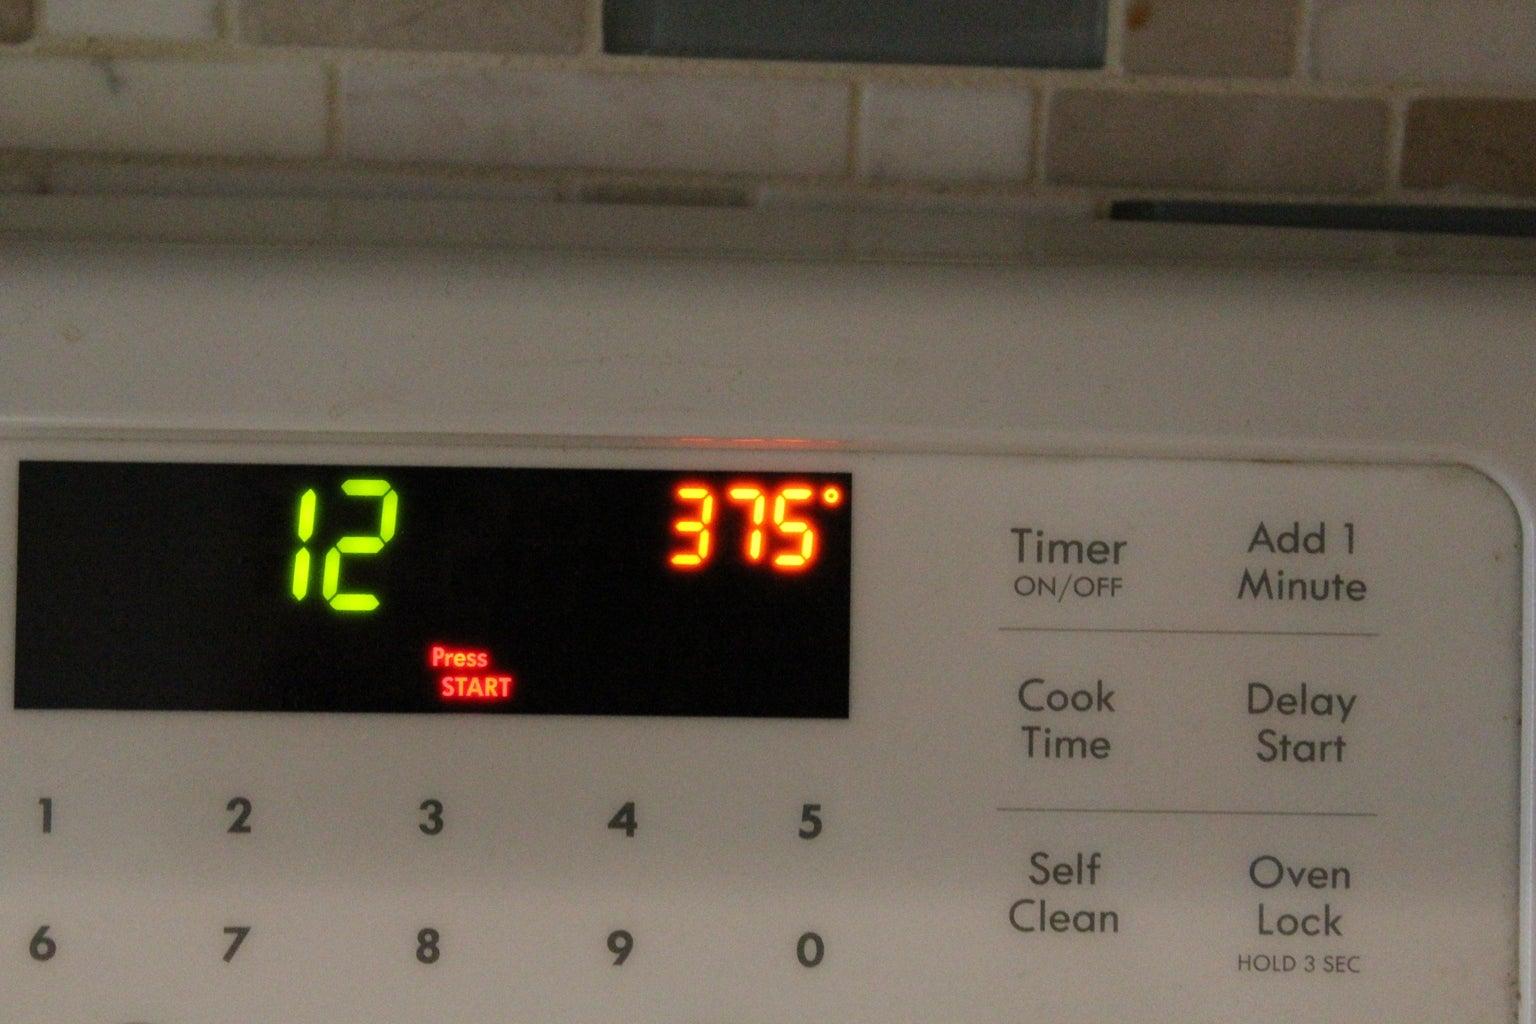 Increase Oven Temperature